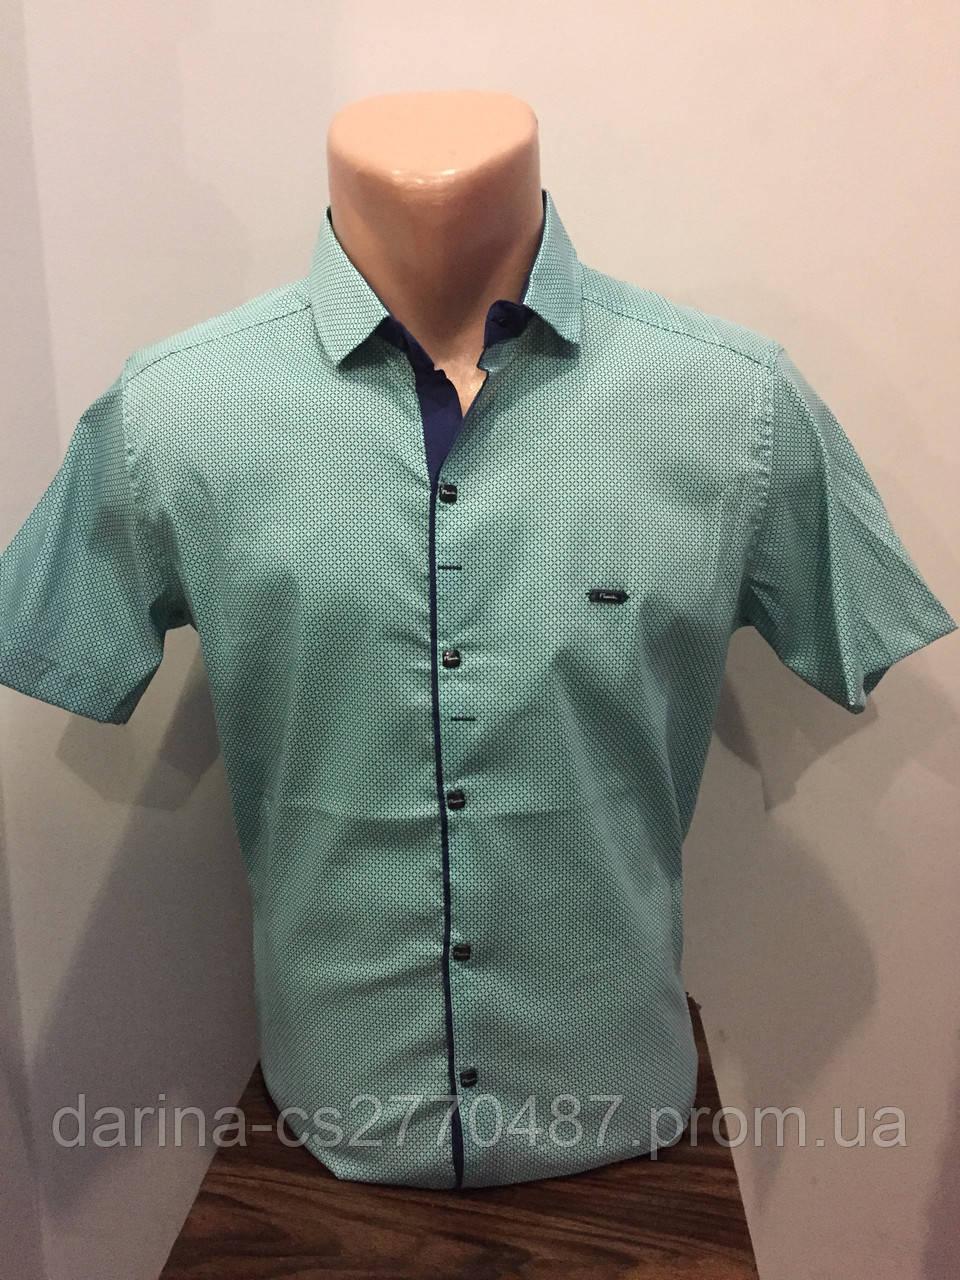 Рубашка мужская с коротким рукавом L